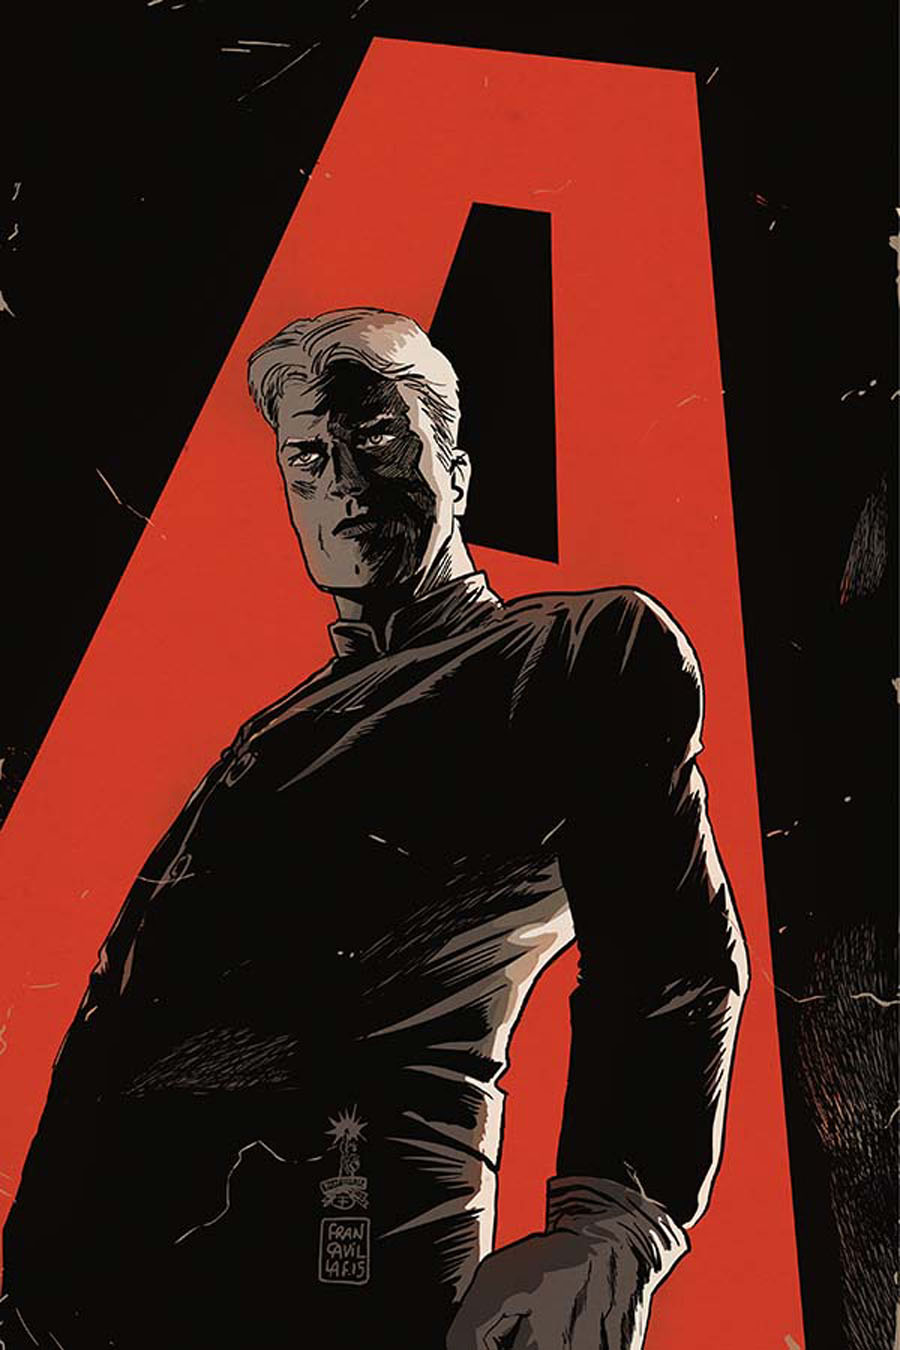 Justice Inc The Avenger #4 Cover B Incentive Francesco Francavilla Virgin Cover